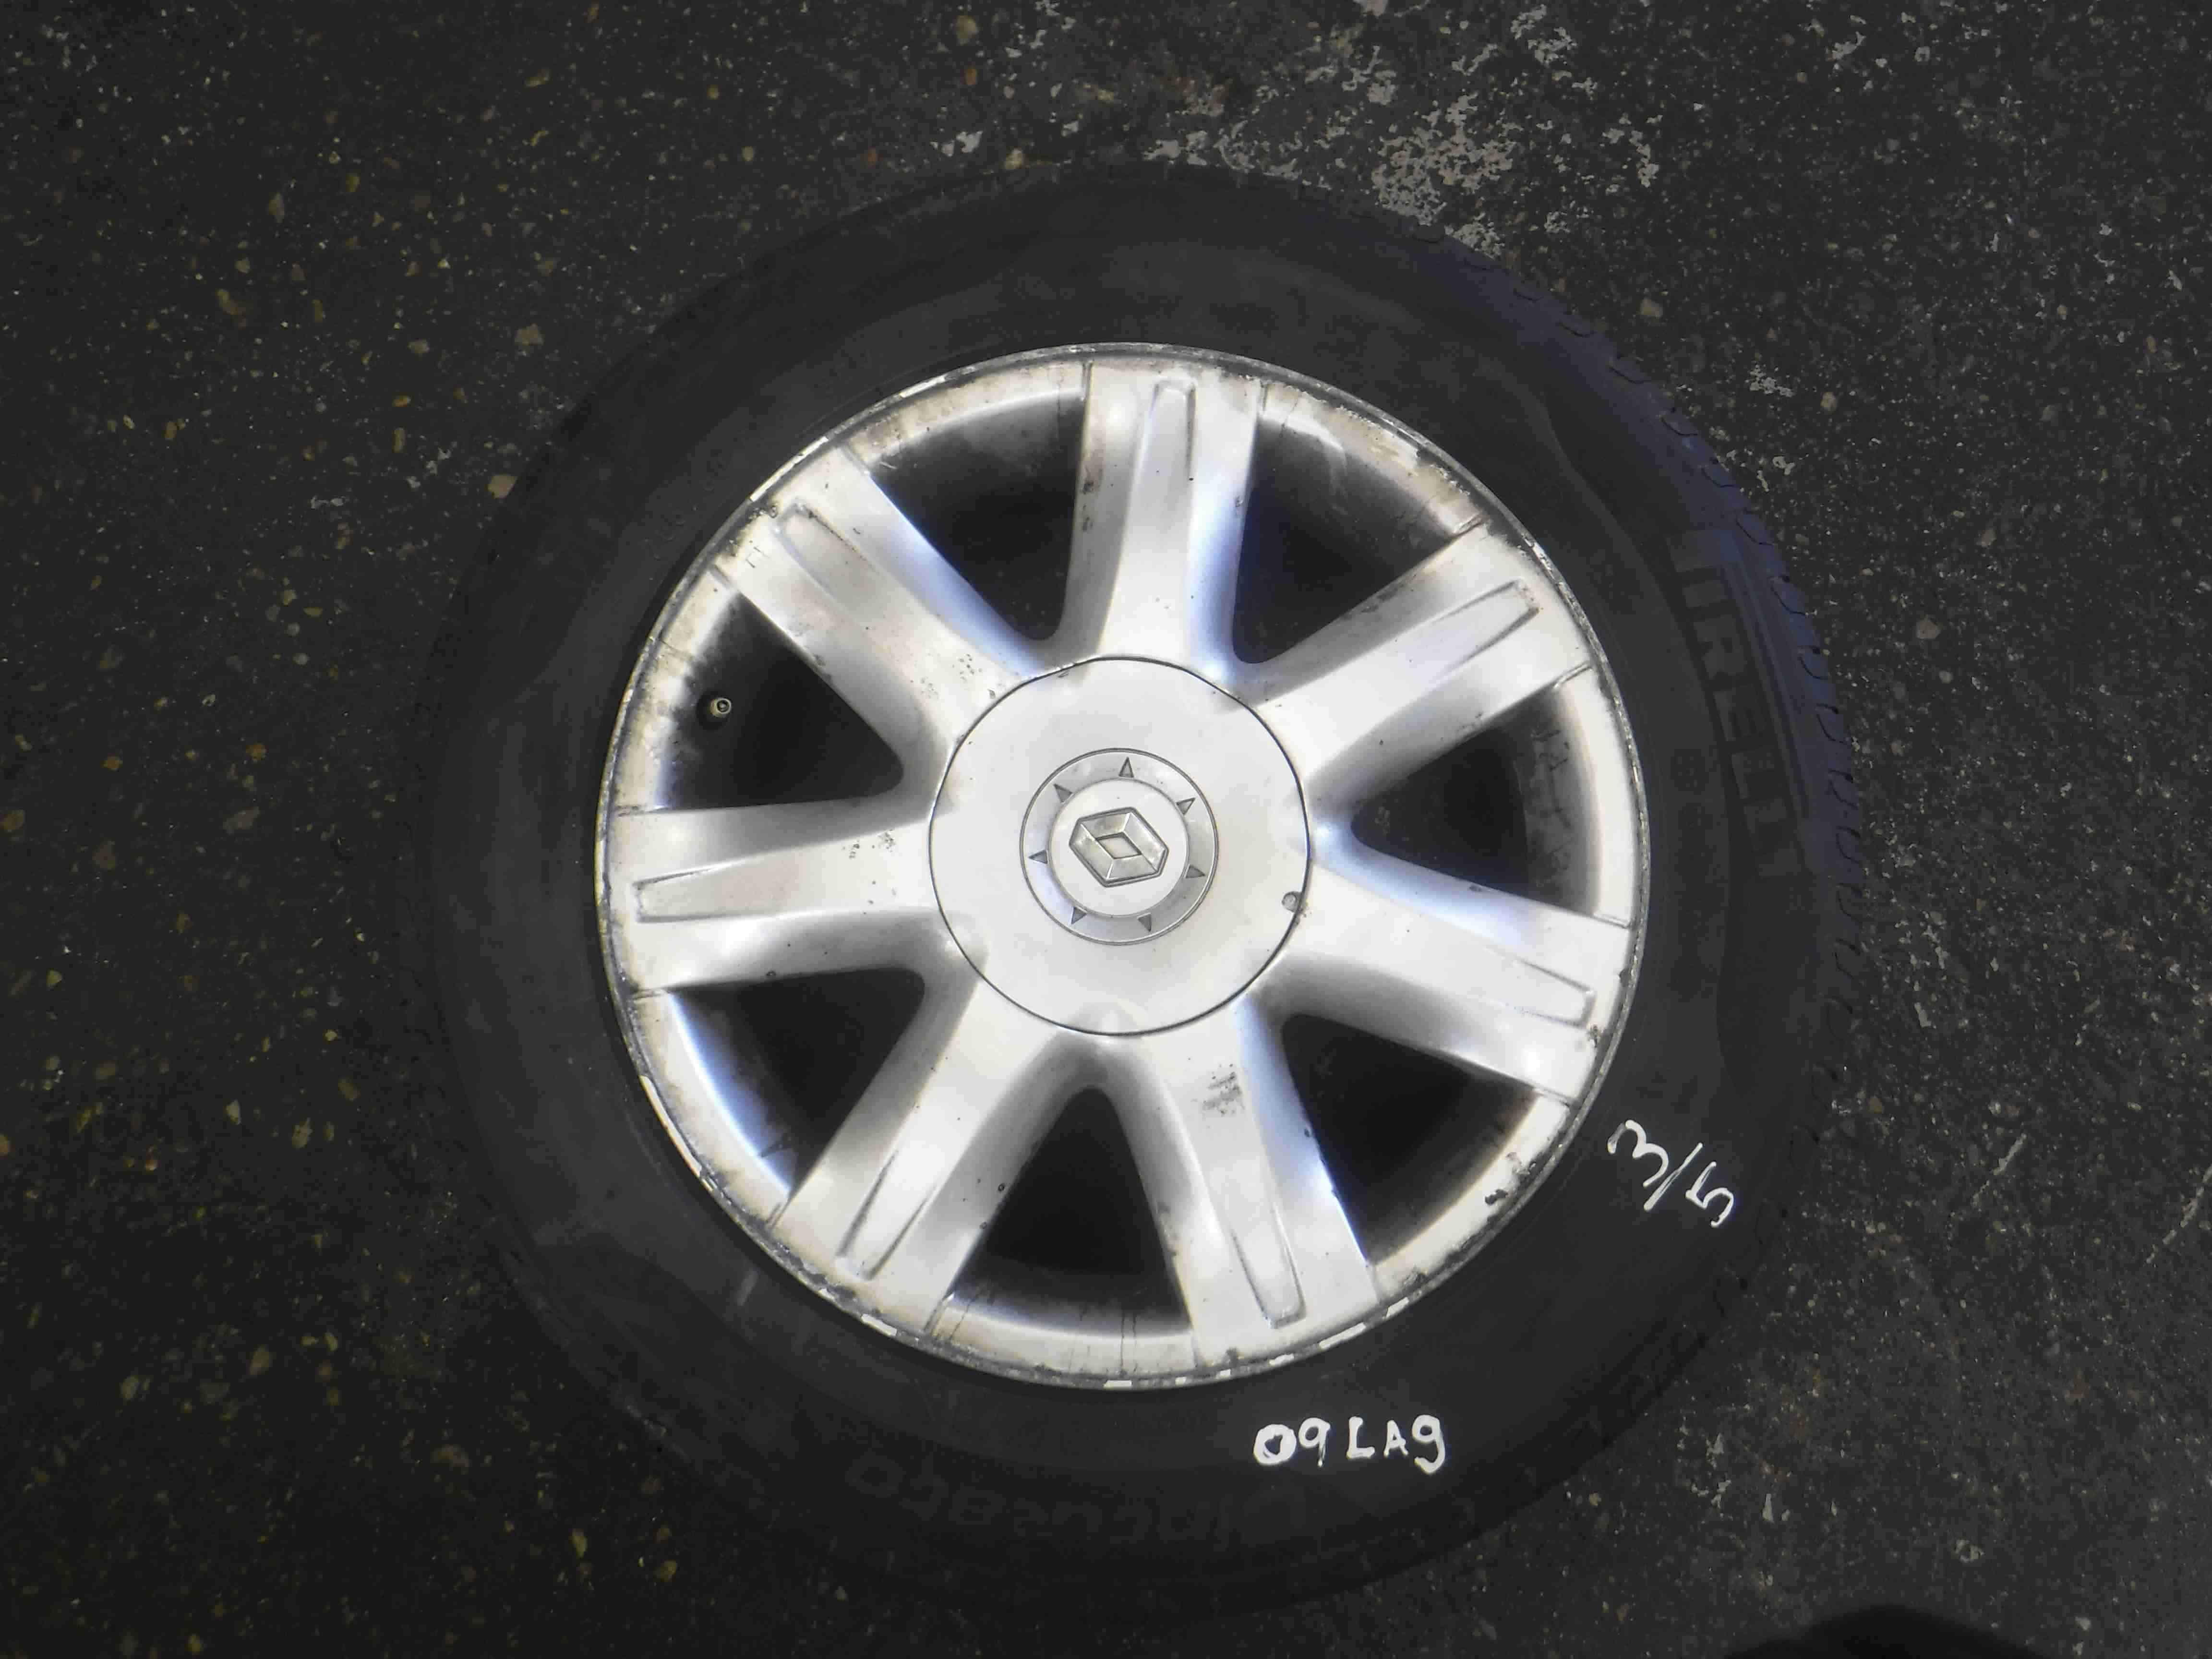 Renault Laguna 2007-2010 Paradise Alloy Wheel Single 3/5 4mm 403000035r